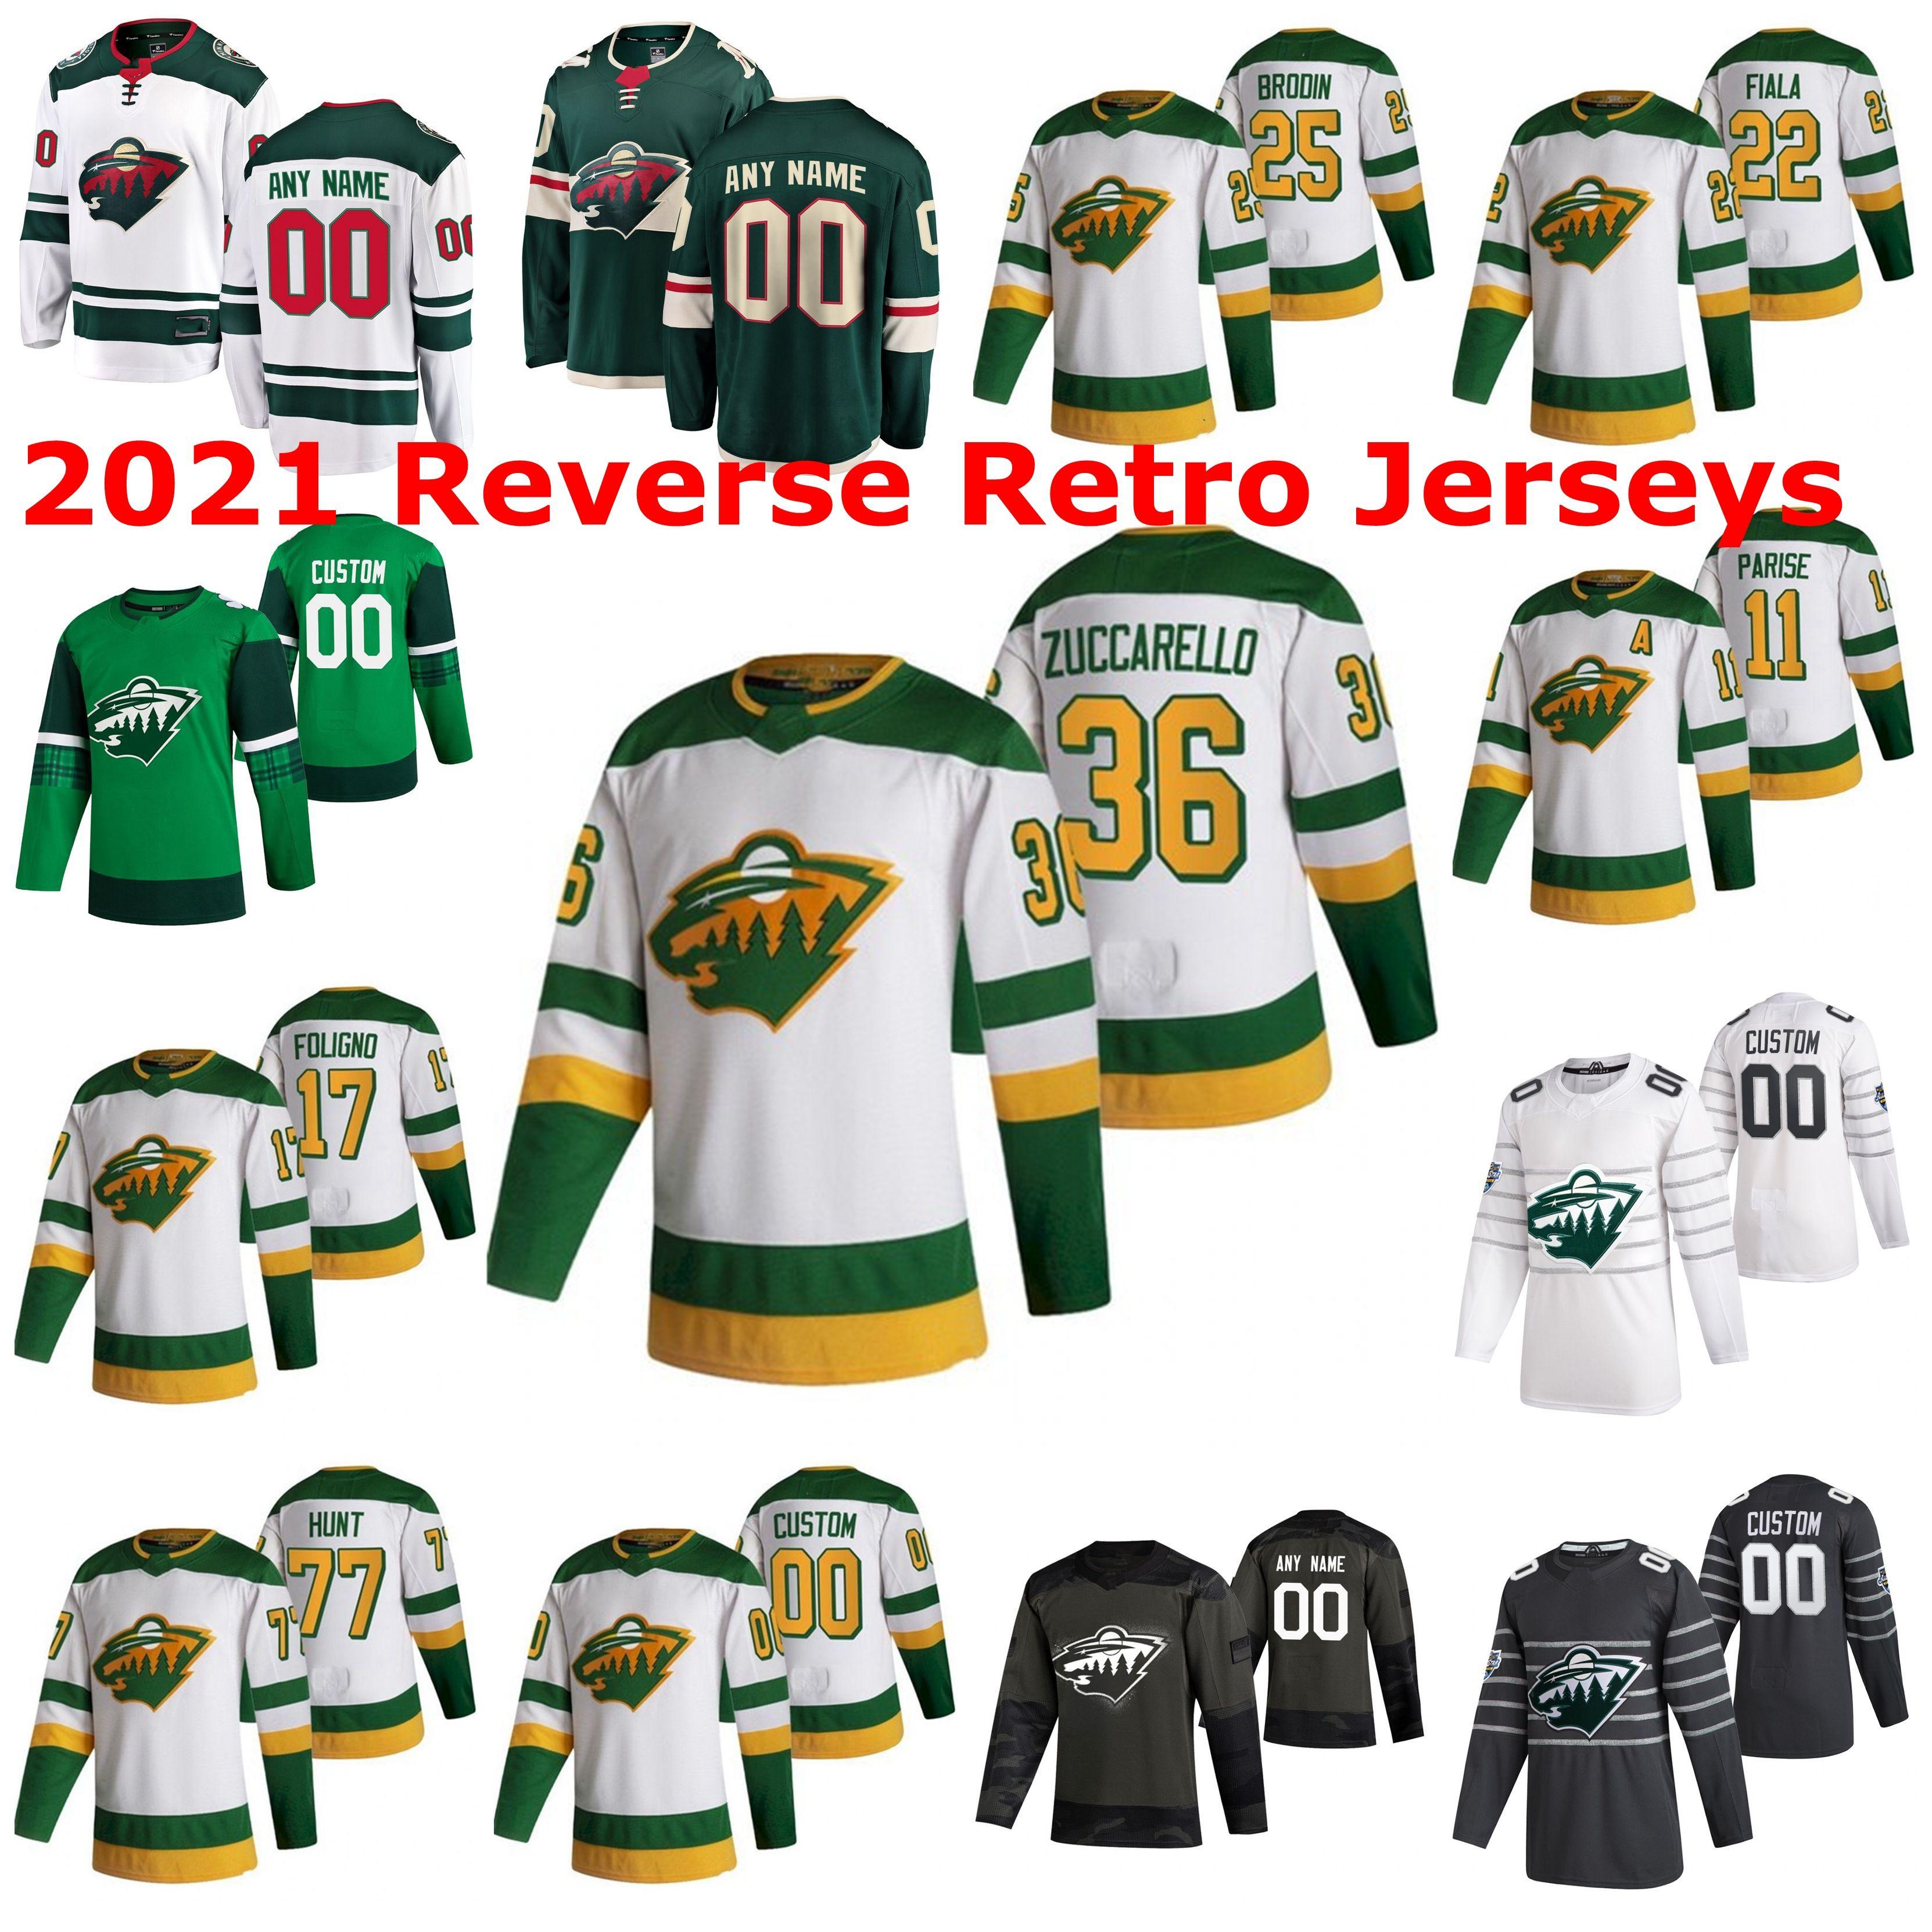 Minnesota Wild 2021 Reverse Retro Jerseys Greg Pateryn Jersey Nick Seeler Carson Soucy Ryan Suter Devan Dubnyk Alex Stalock Custom Stitched